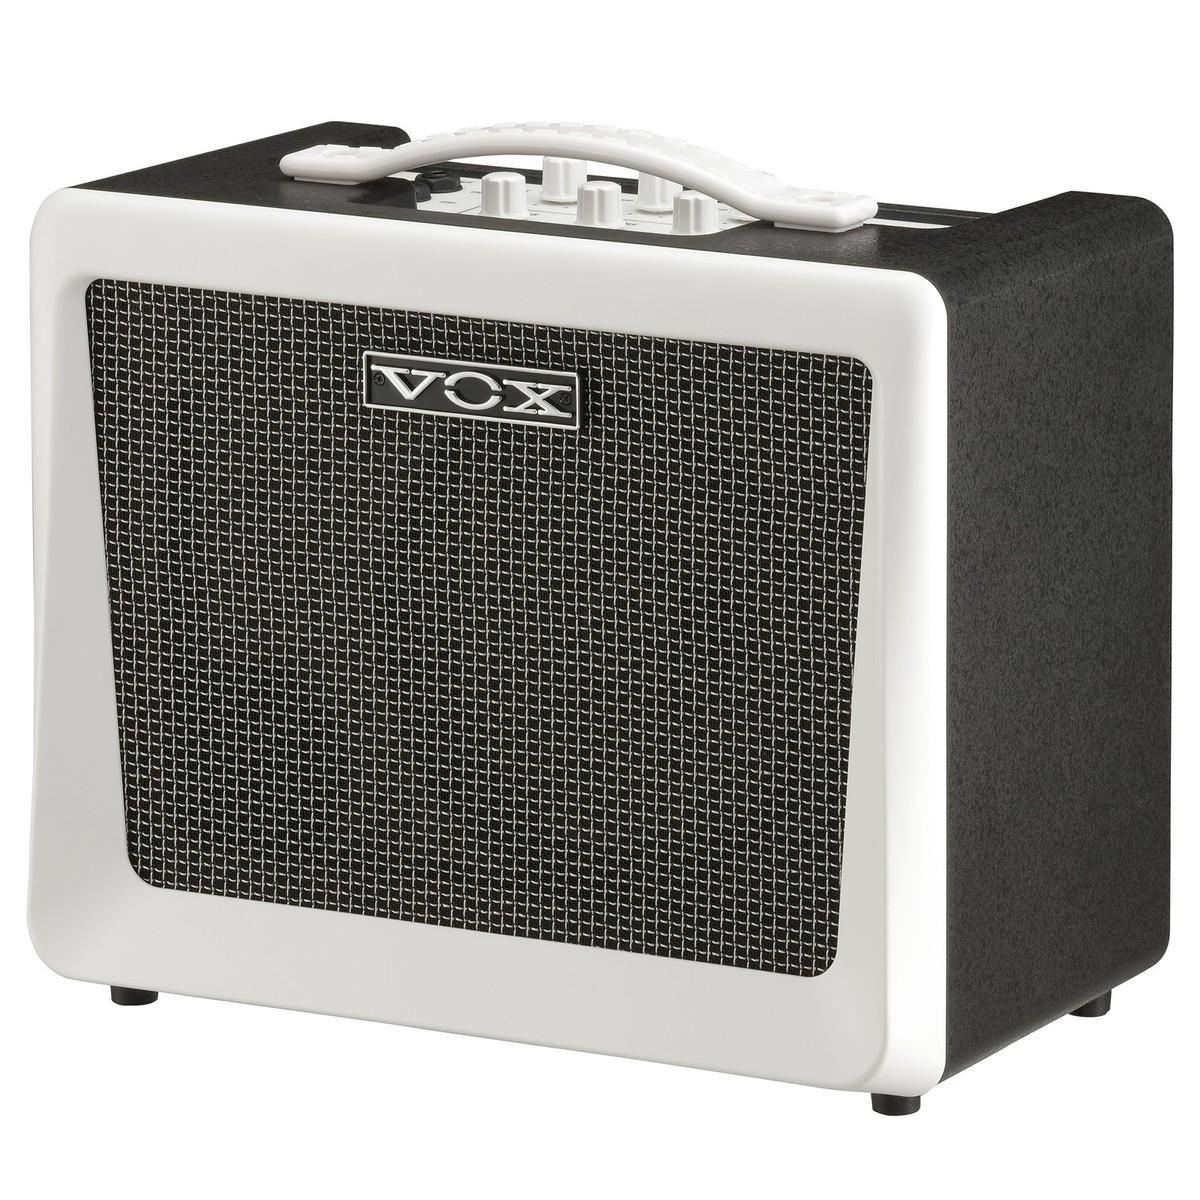 Vox Vx50 Kb Portable Keyboard Amplifier At Gear4music Project 116 Subwoofer Amp Loading Zoom